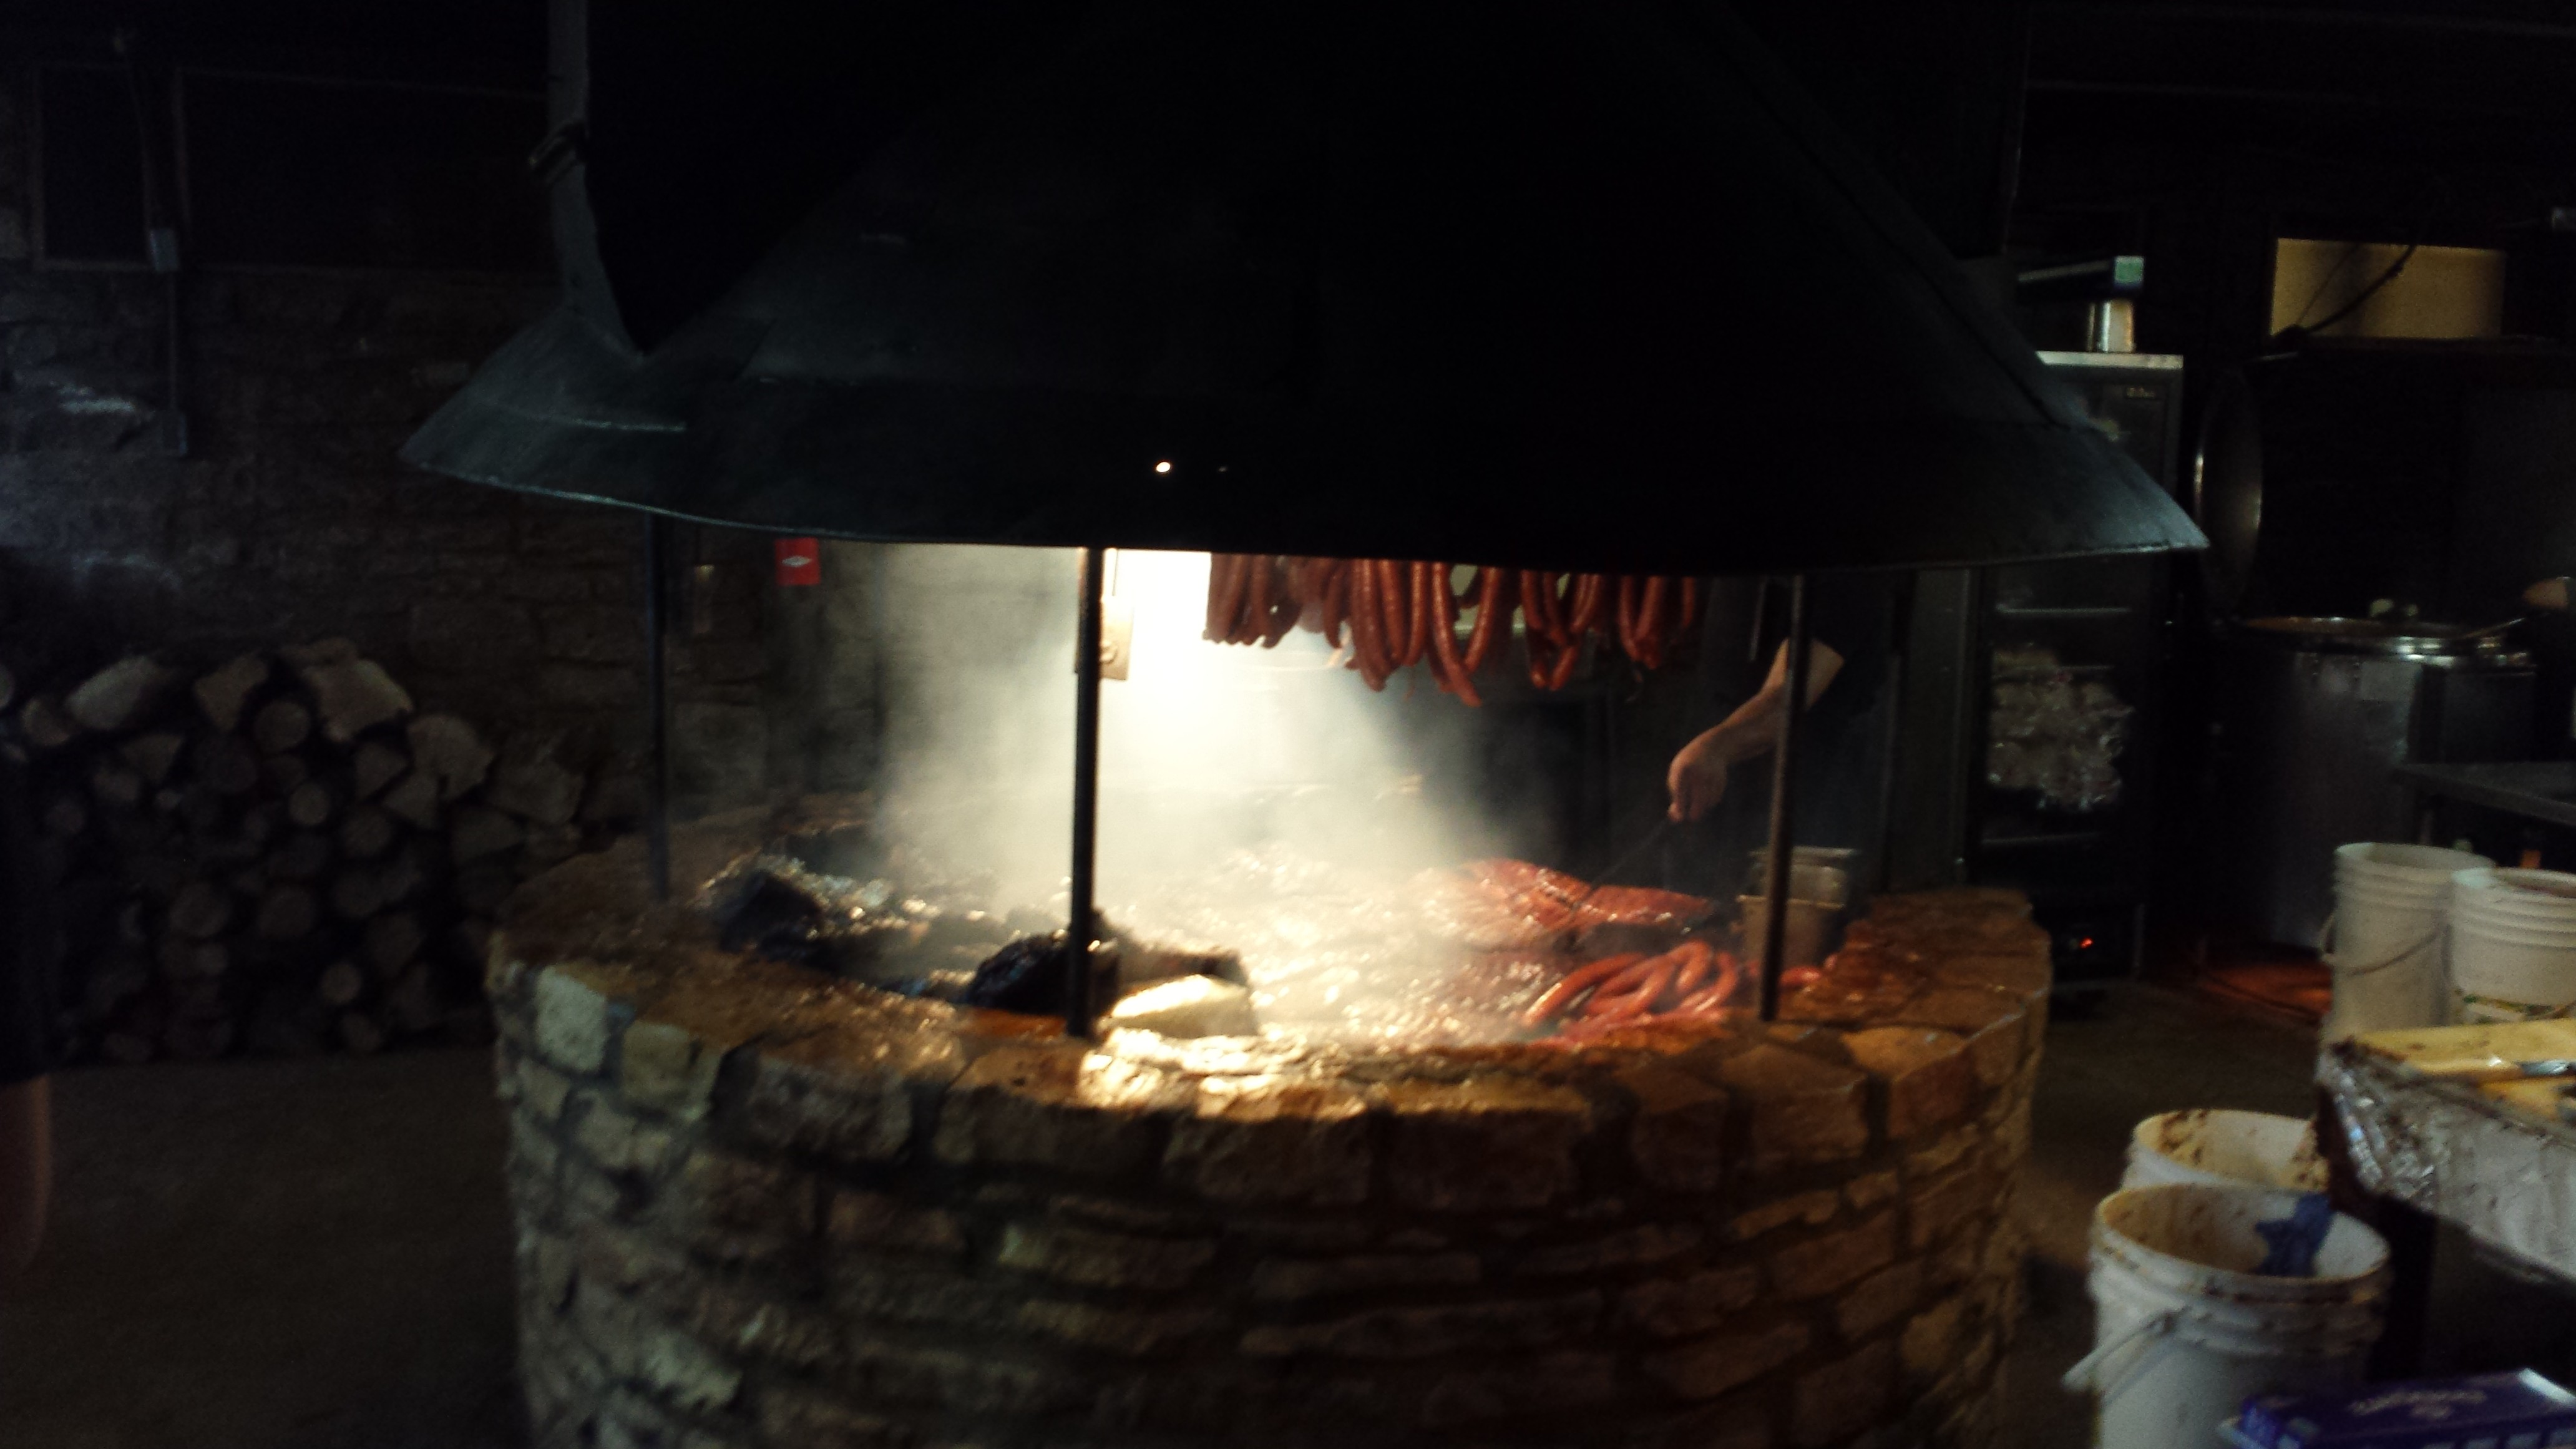 The pit inside the original Salt Lick building. Yum